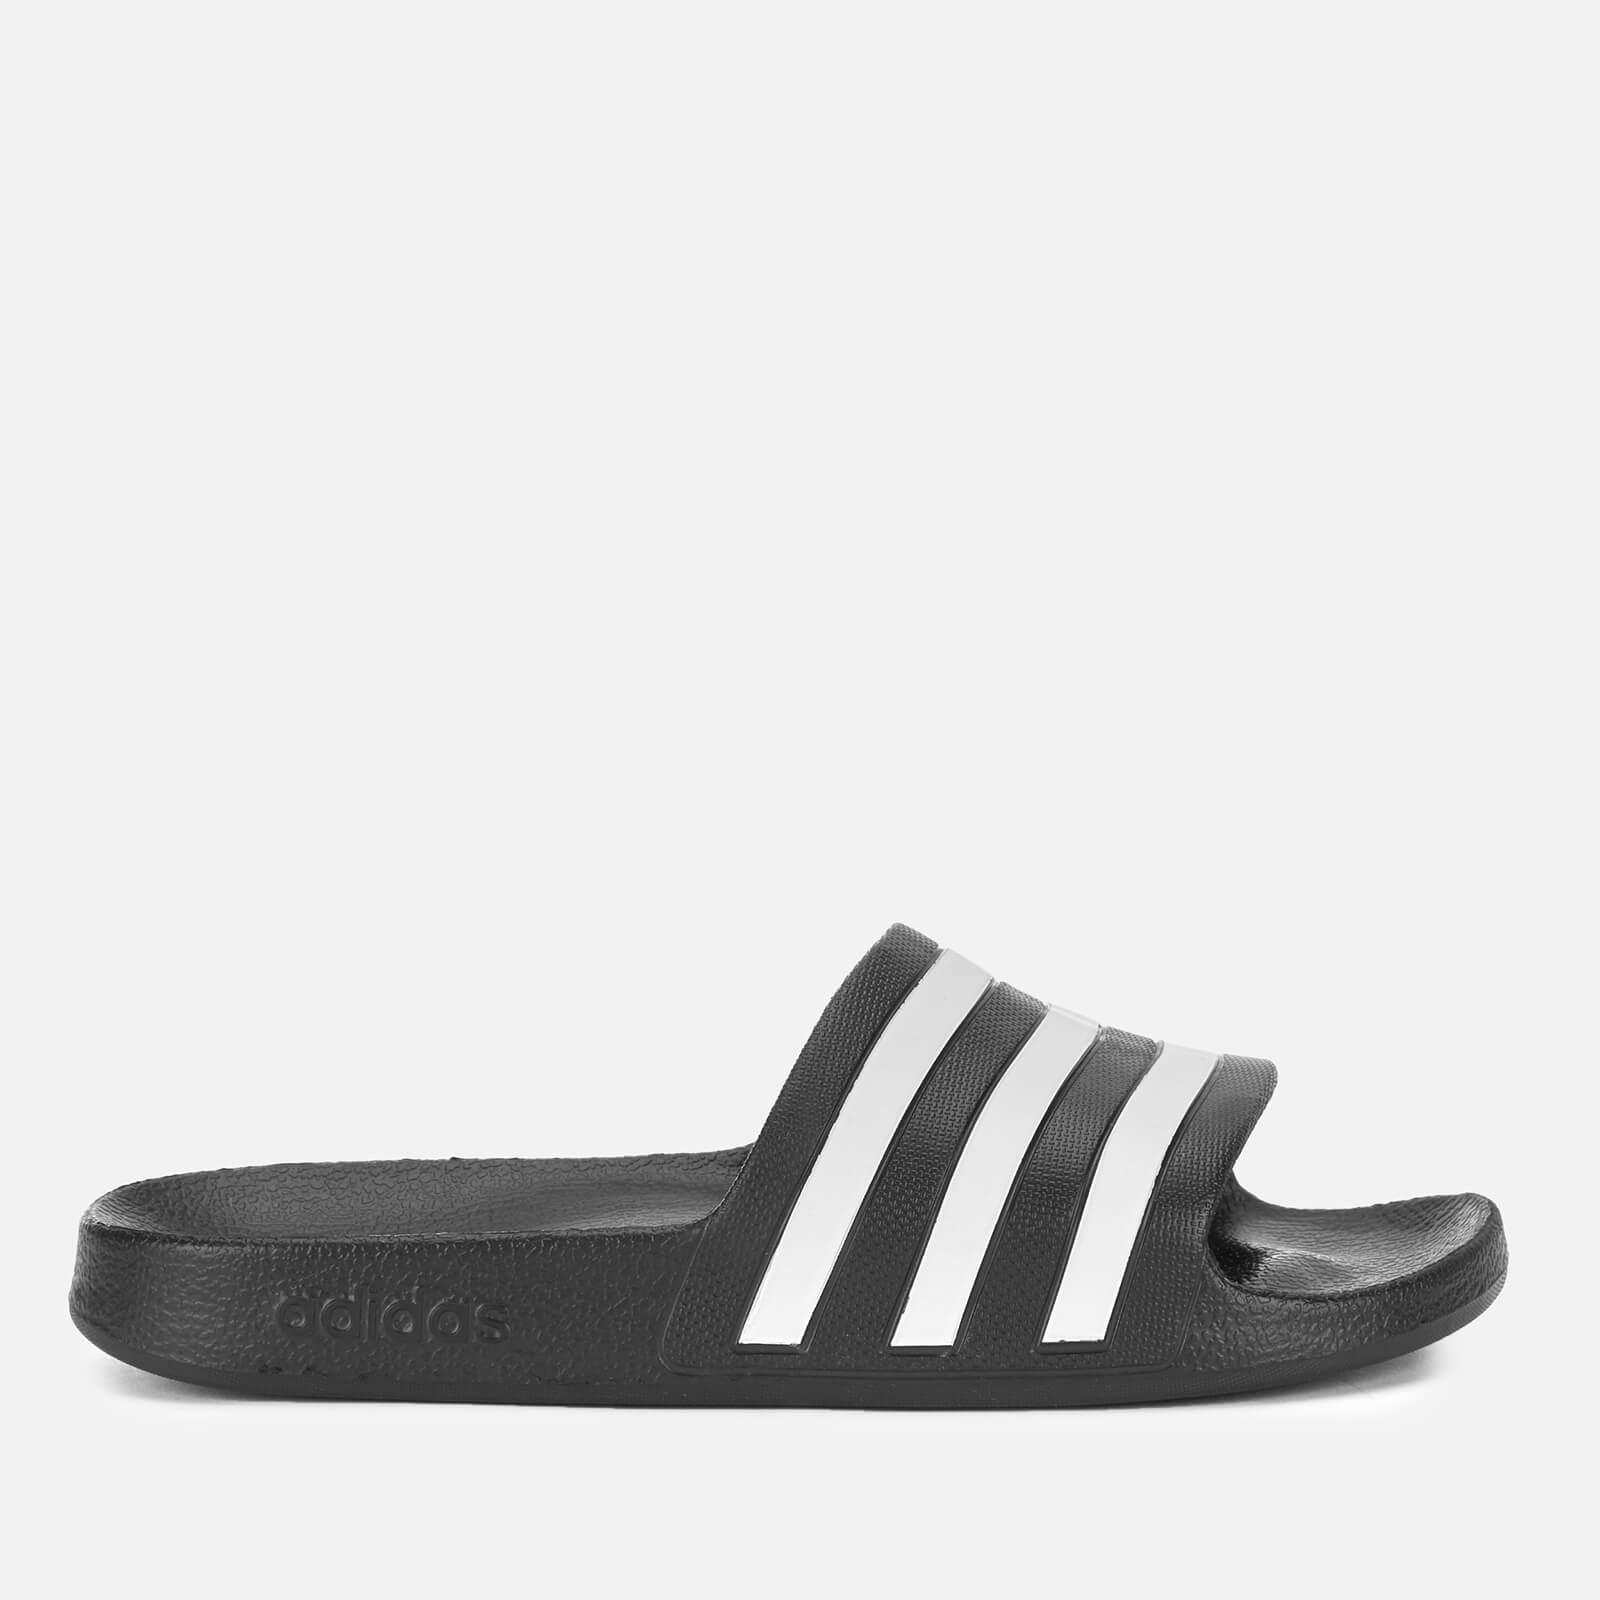 356d49c0230548 Adidas - Black Adilette Aqua Slide Sandals for Men - Lyst. View fullscreen